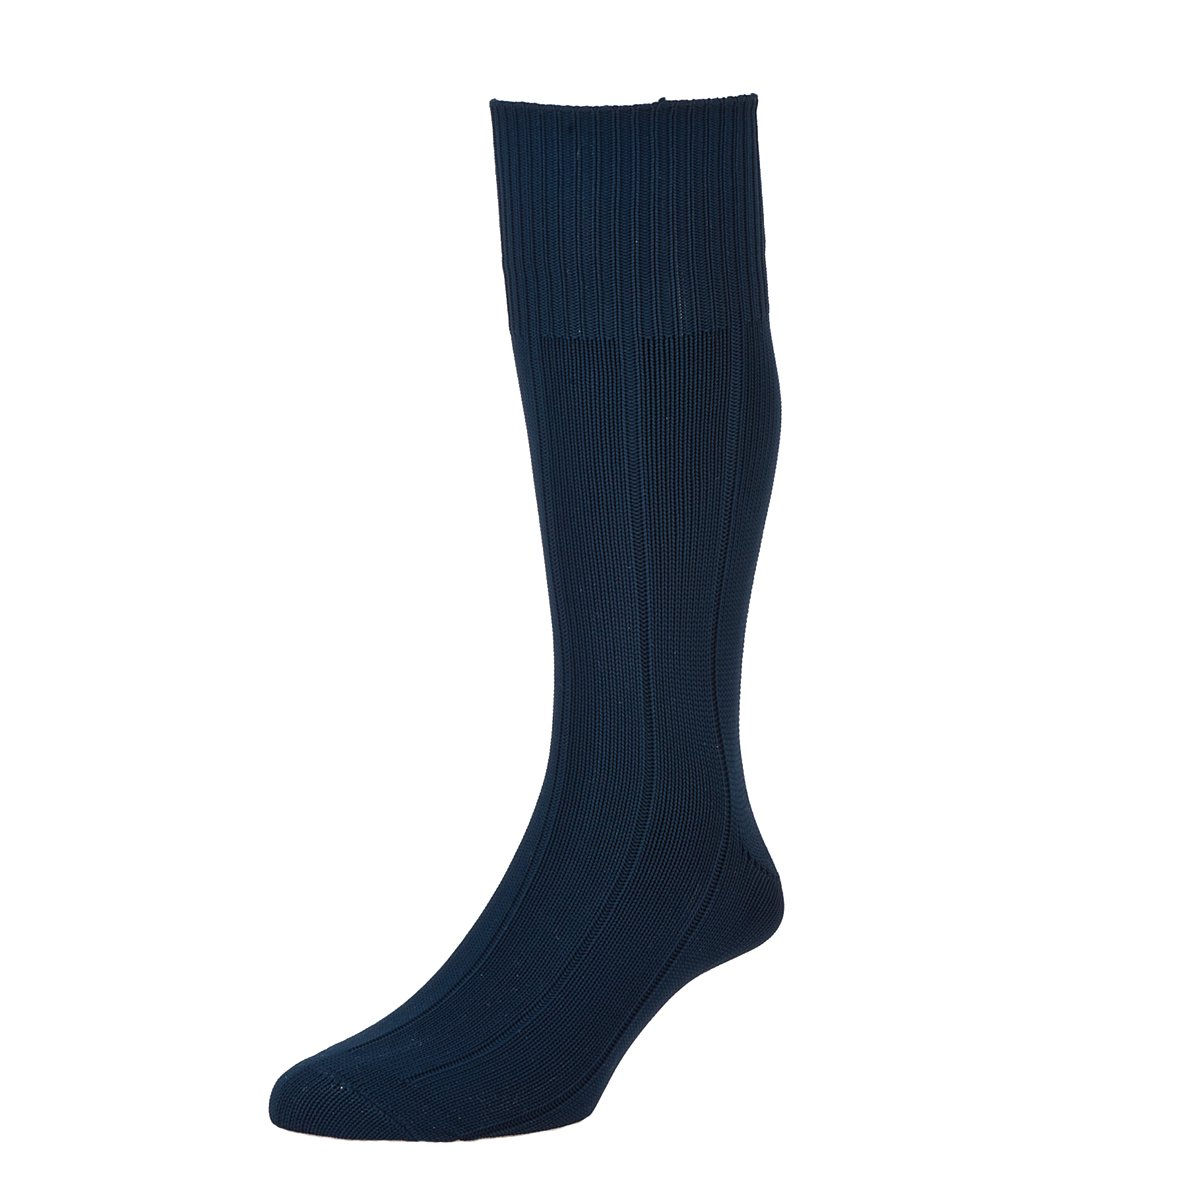 Mens HJ Hall Indestuctible Socks - Long Length Above Calf - HJ1 Socks MSOXHJ1 1PK 6-11 Black